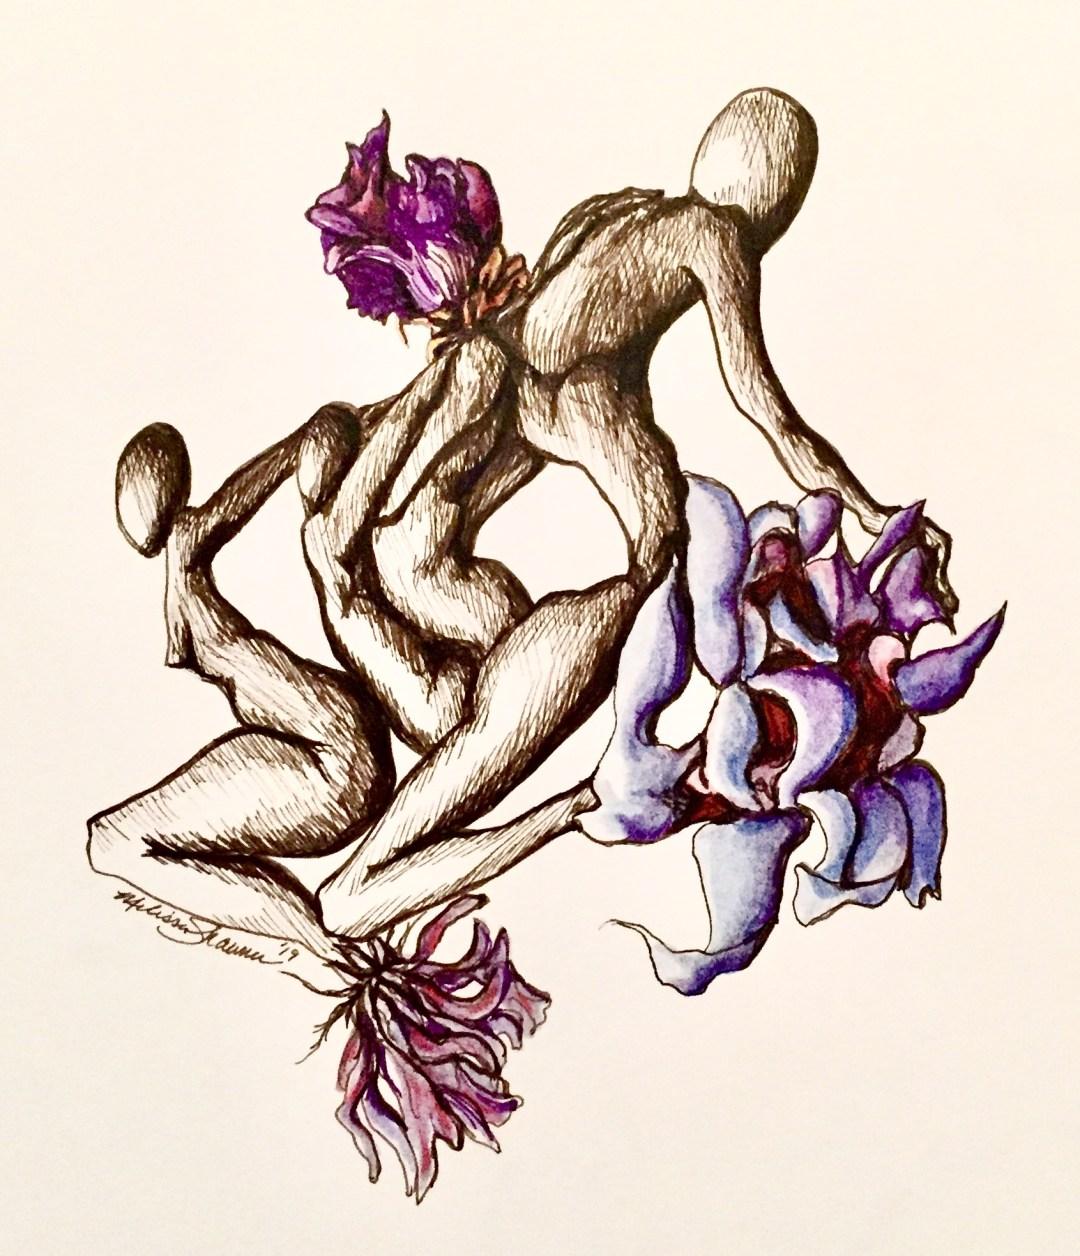 in bloom, by Melissa Shawnee